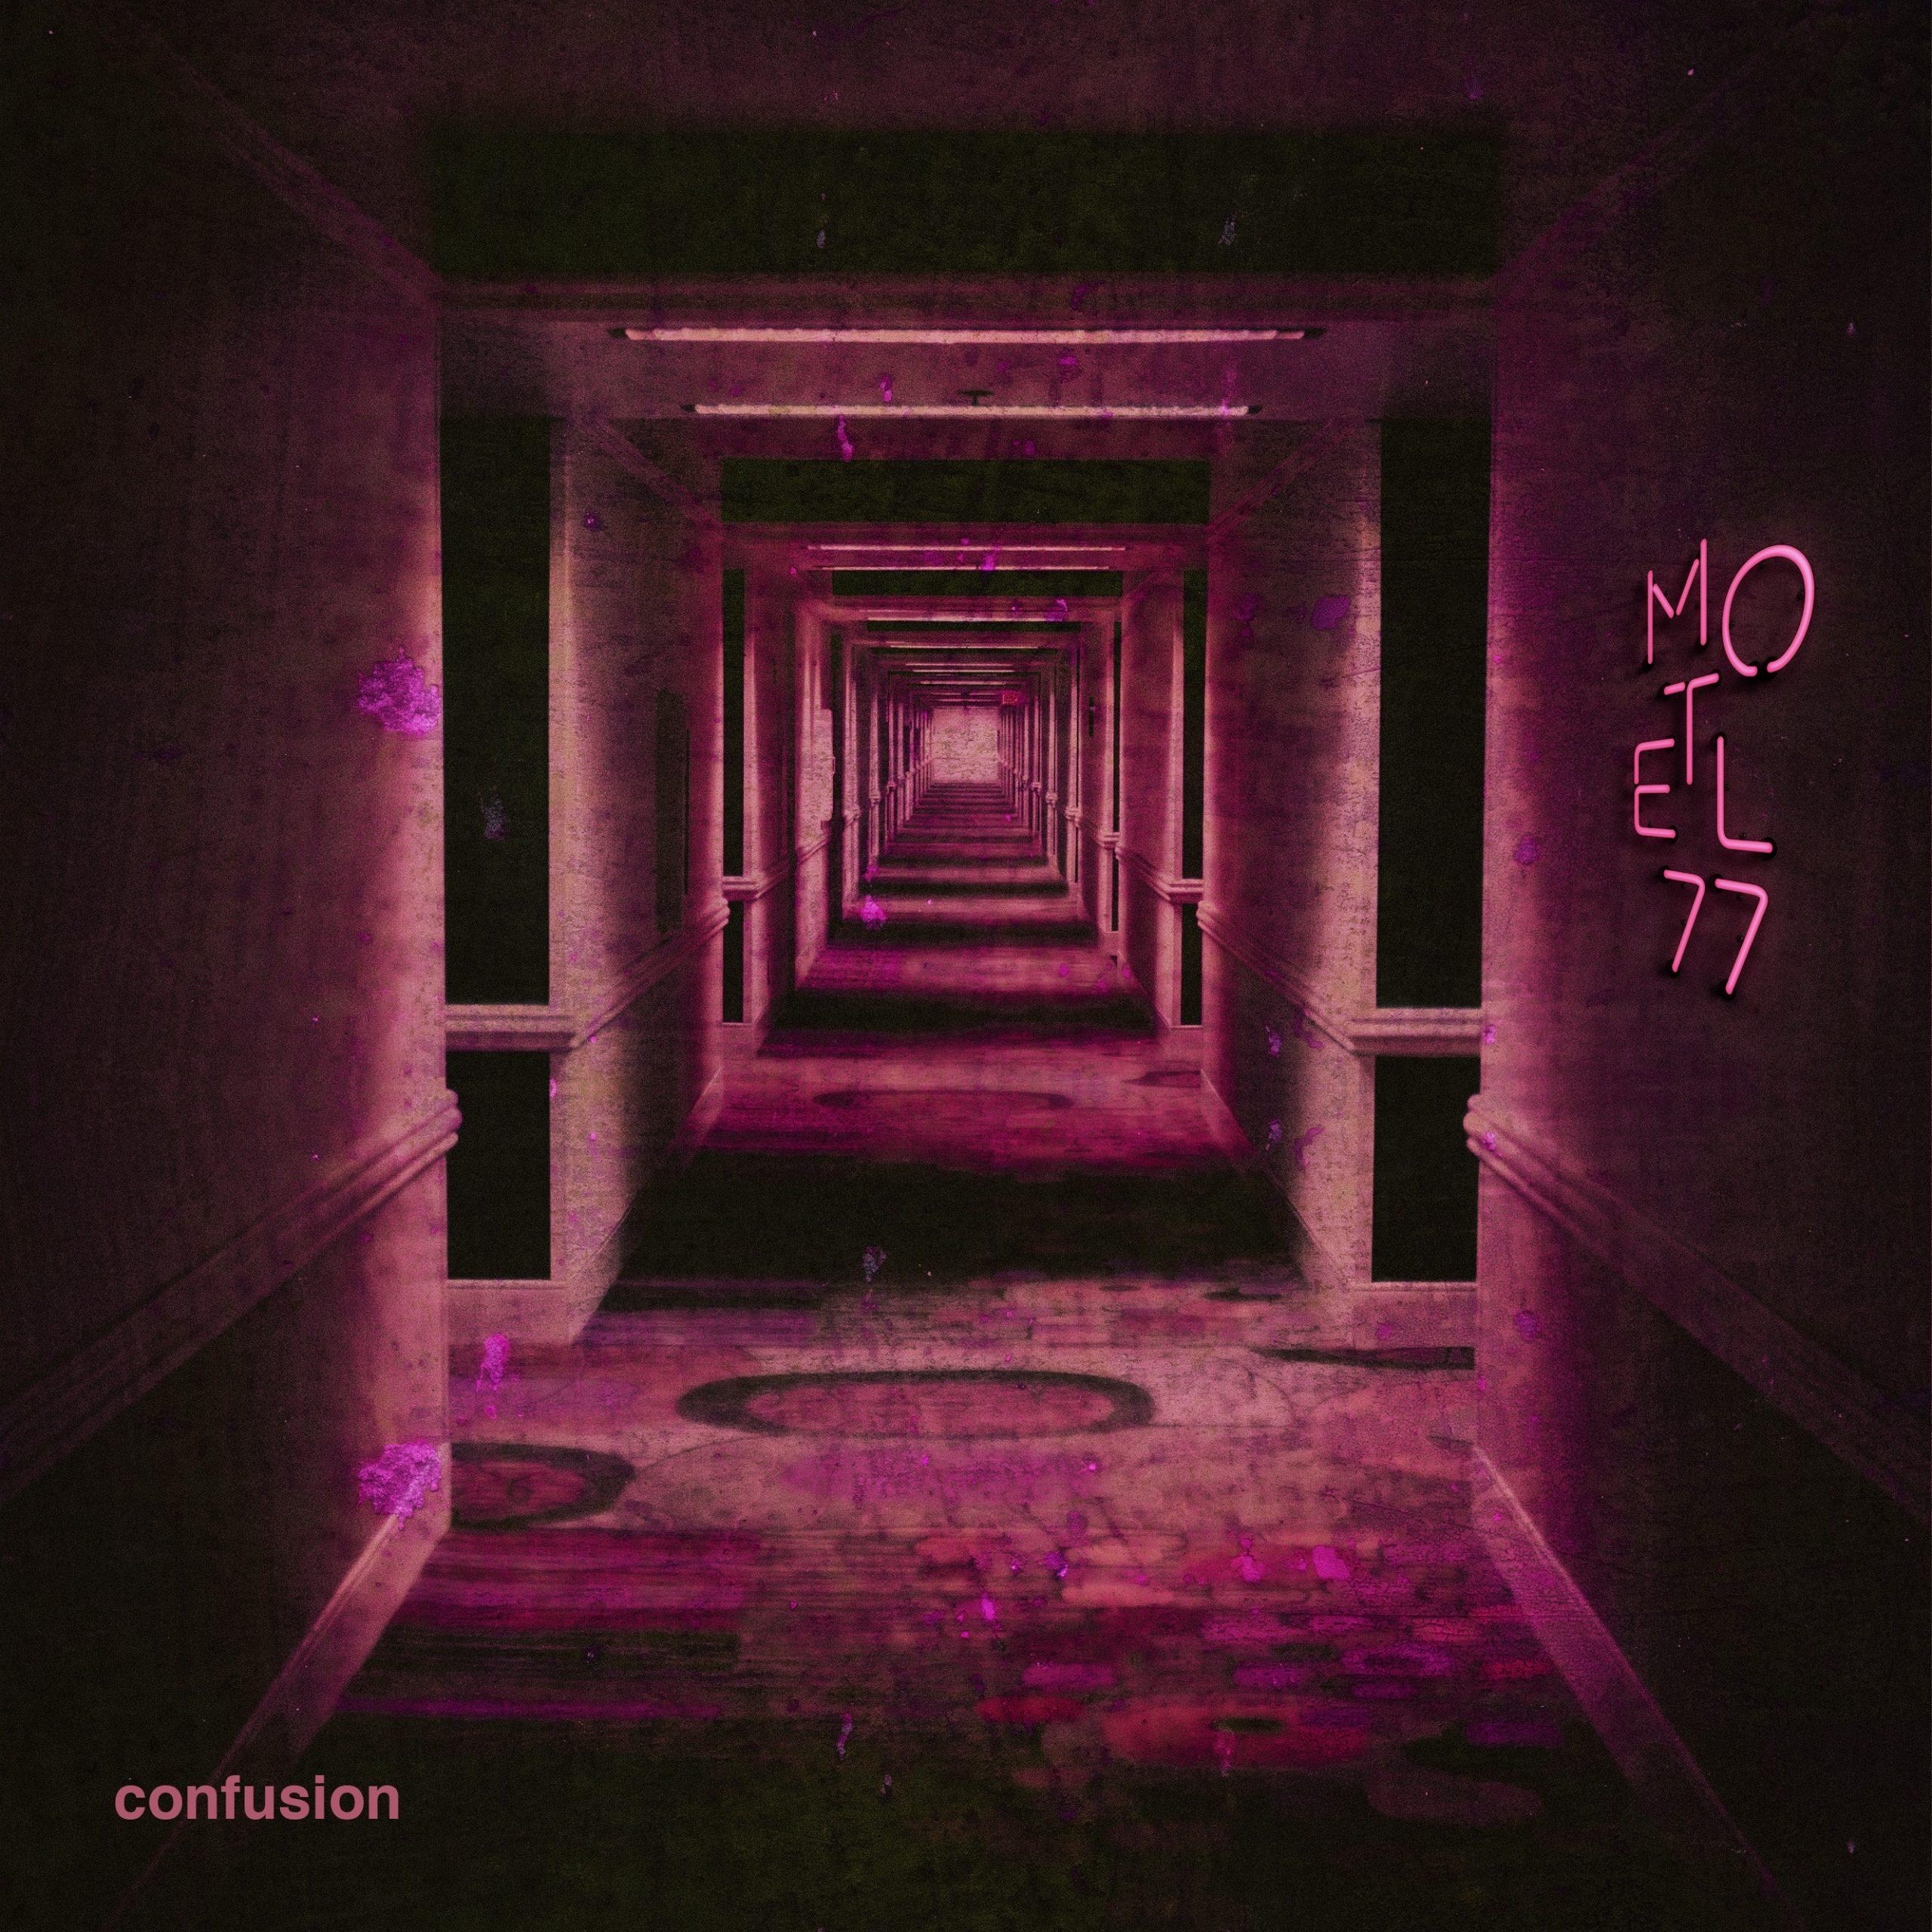 PREMIERE – Motel 77 – Confusion (Pink Language Dreamtime Mix) (Nein Records)